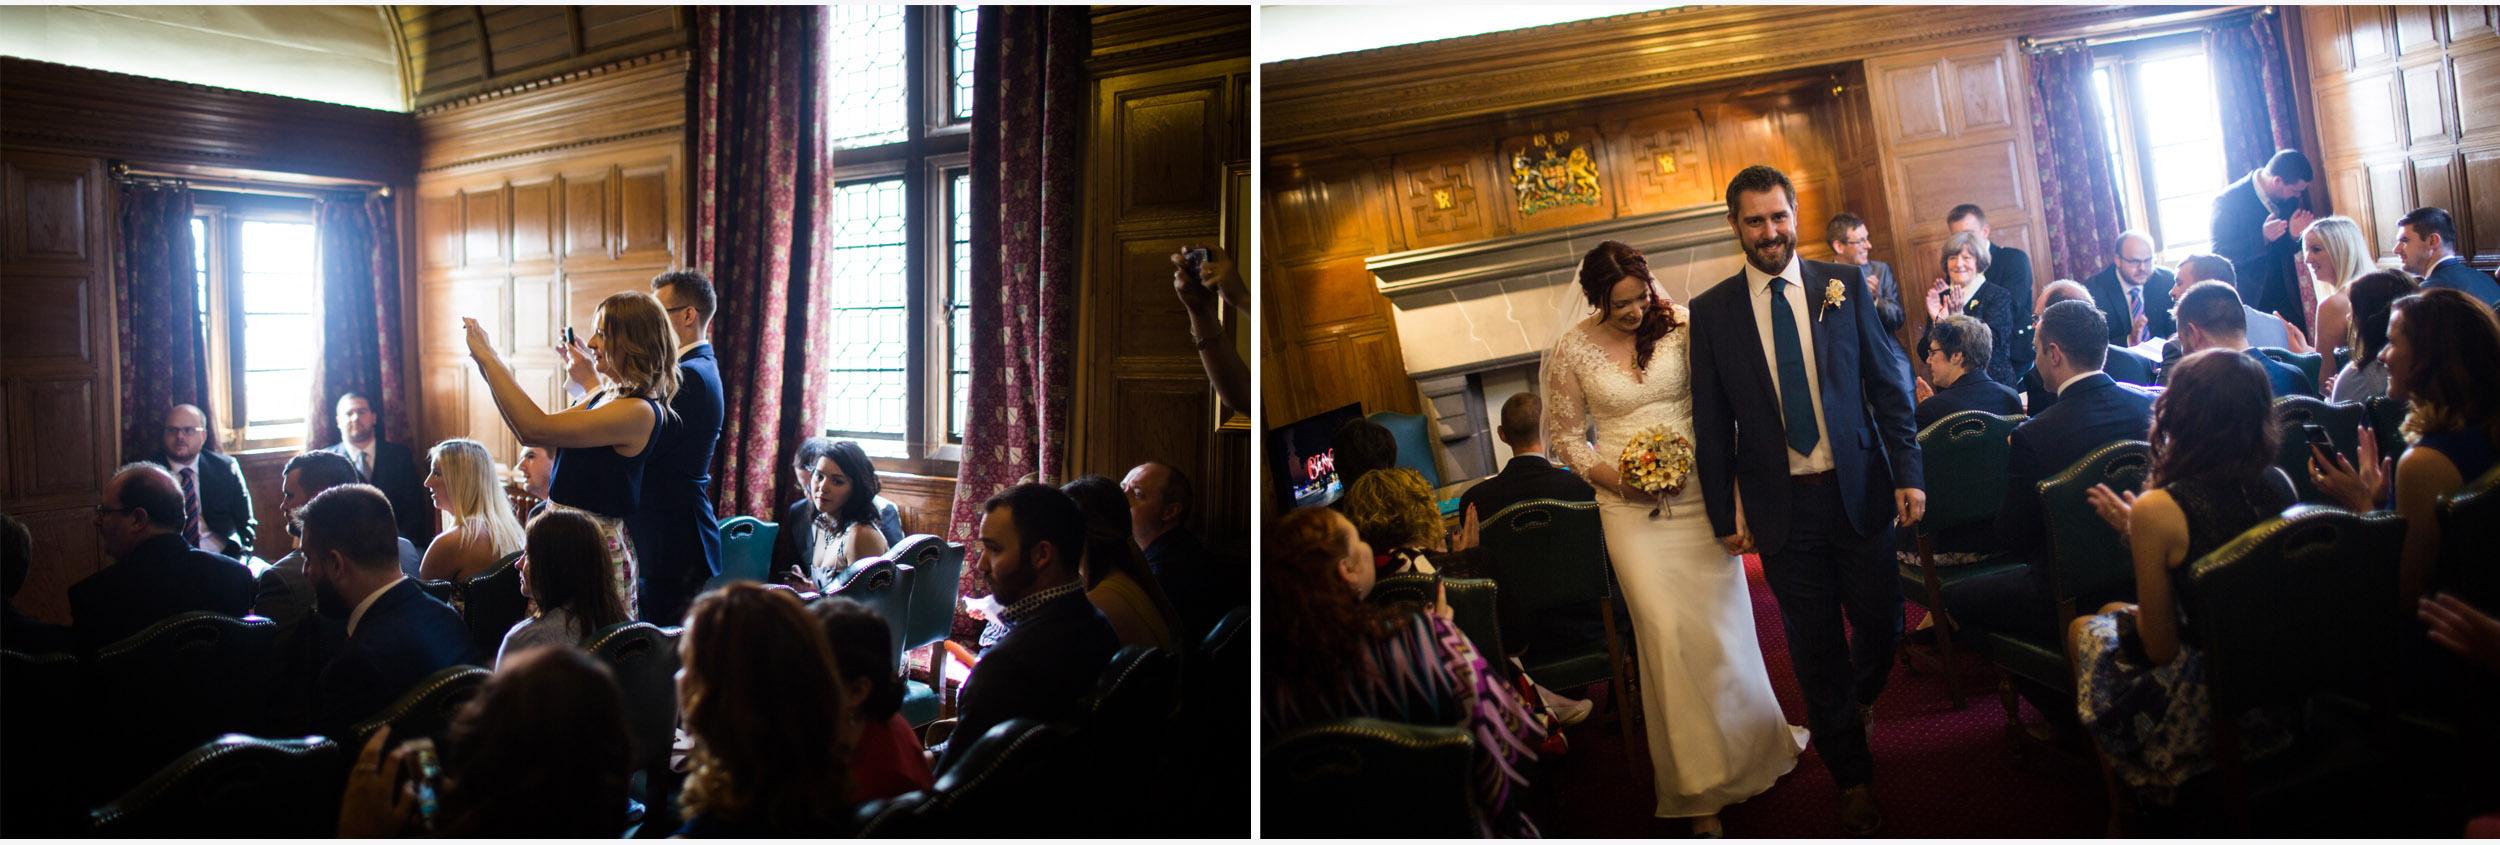 Sonia and David's wedding-10.jpg